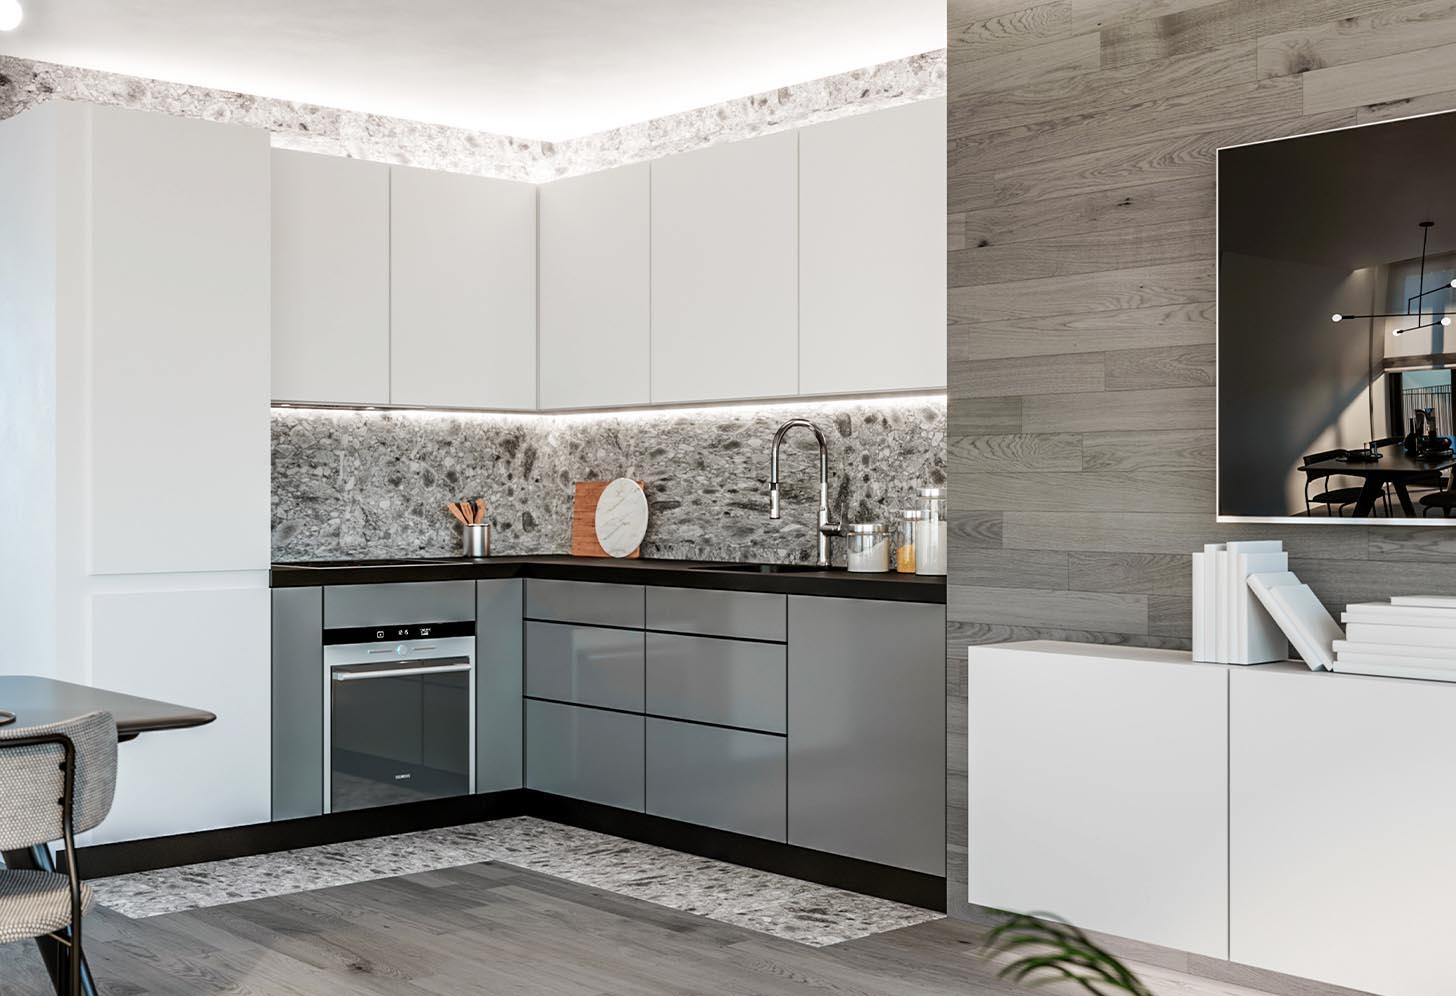 immobilier neuf espagne costa blanca on-a4 san vicente cuisine